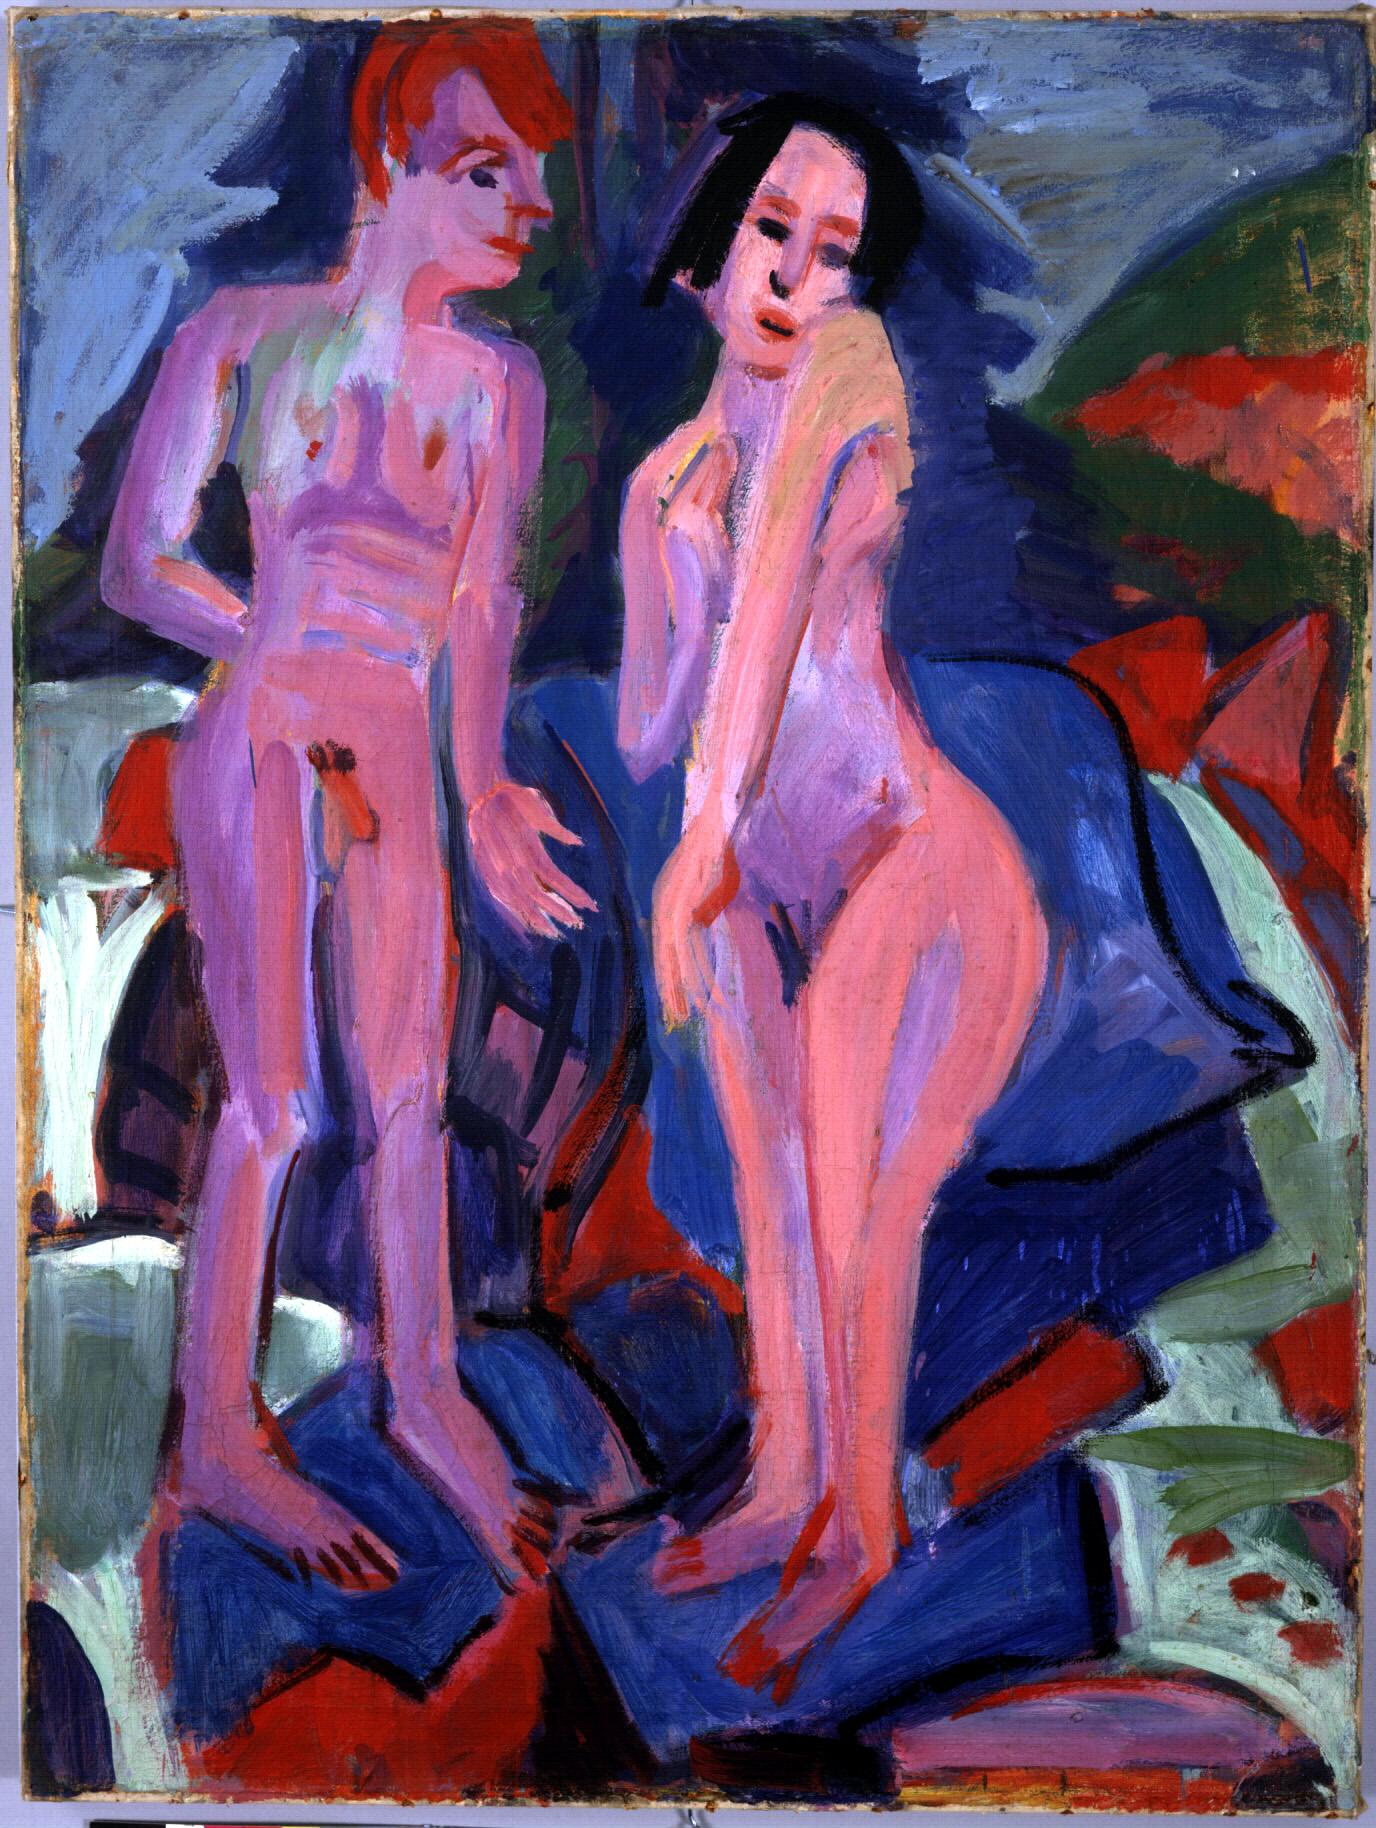 Ernst Ludwig Kirchner, Nacktes Paar am Wasserfall, 1923, Öl auf Leinwand, 102,5 x 76,3 cm